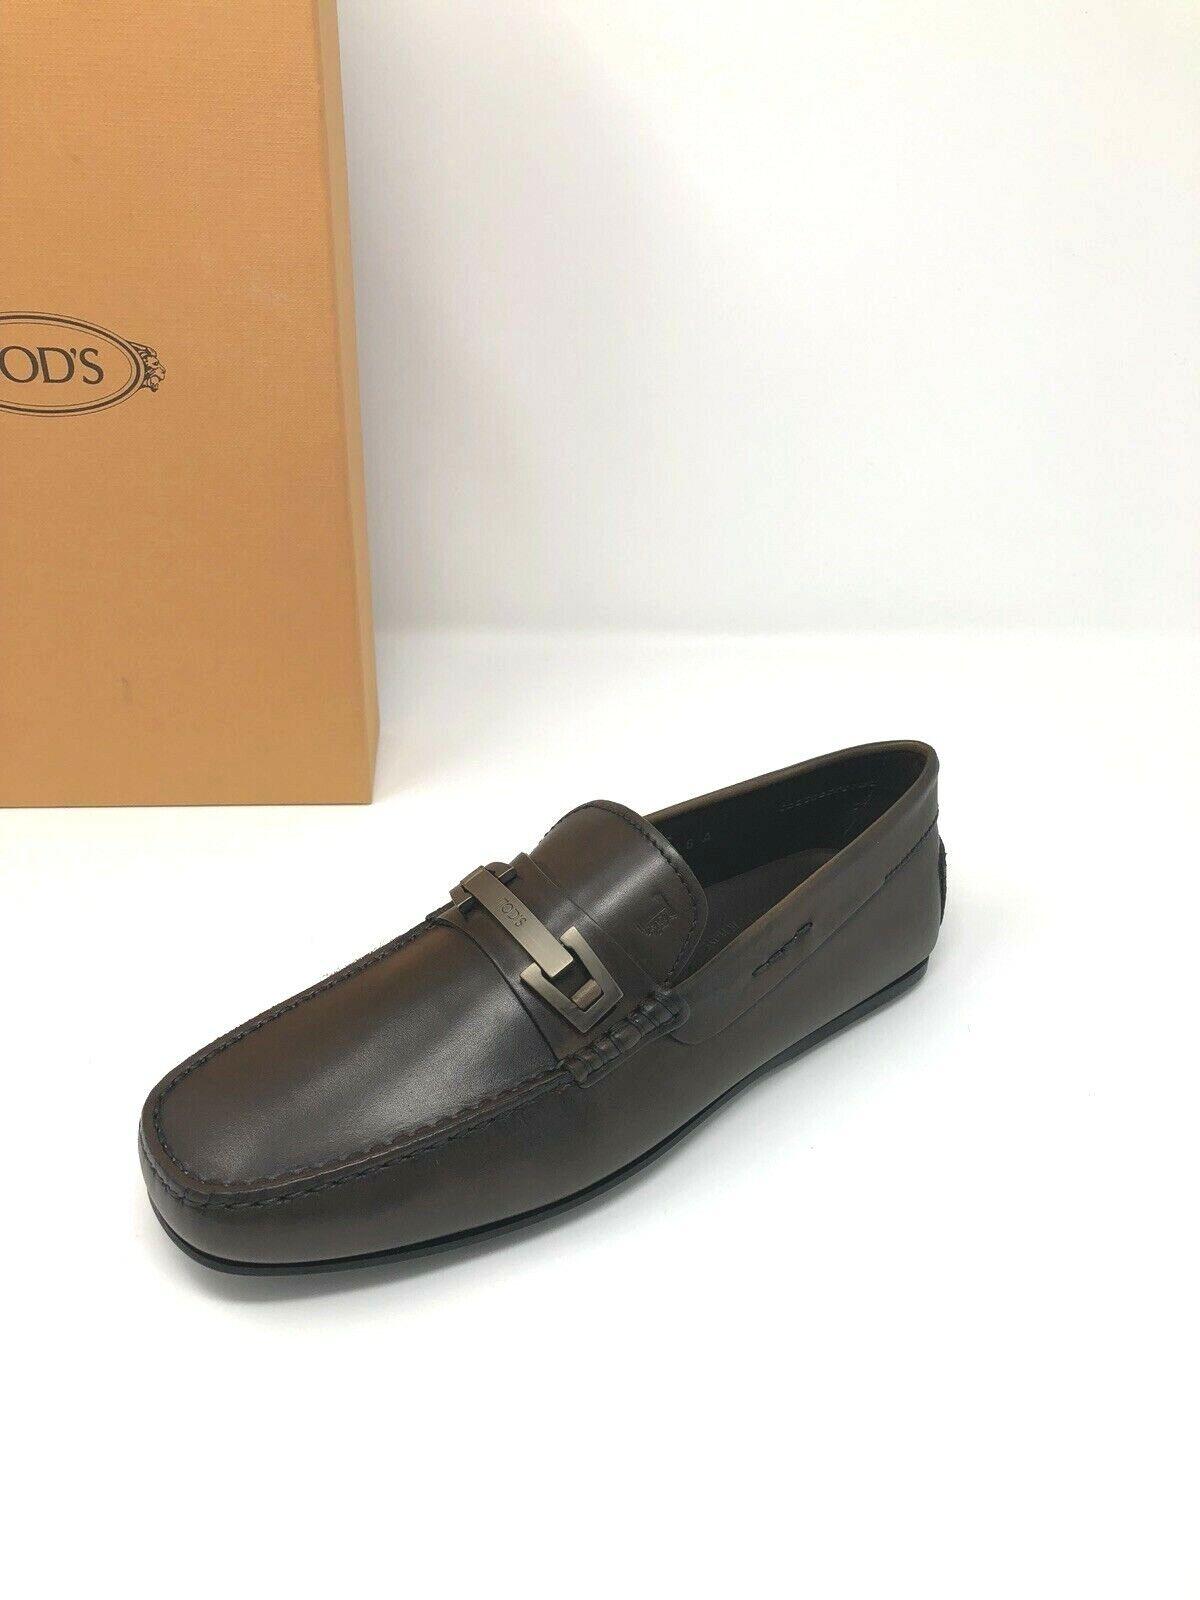 595 New Tods Mens Marroneee scarpe Gommino Loafers 6.5 US 5.5 EU